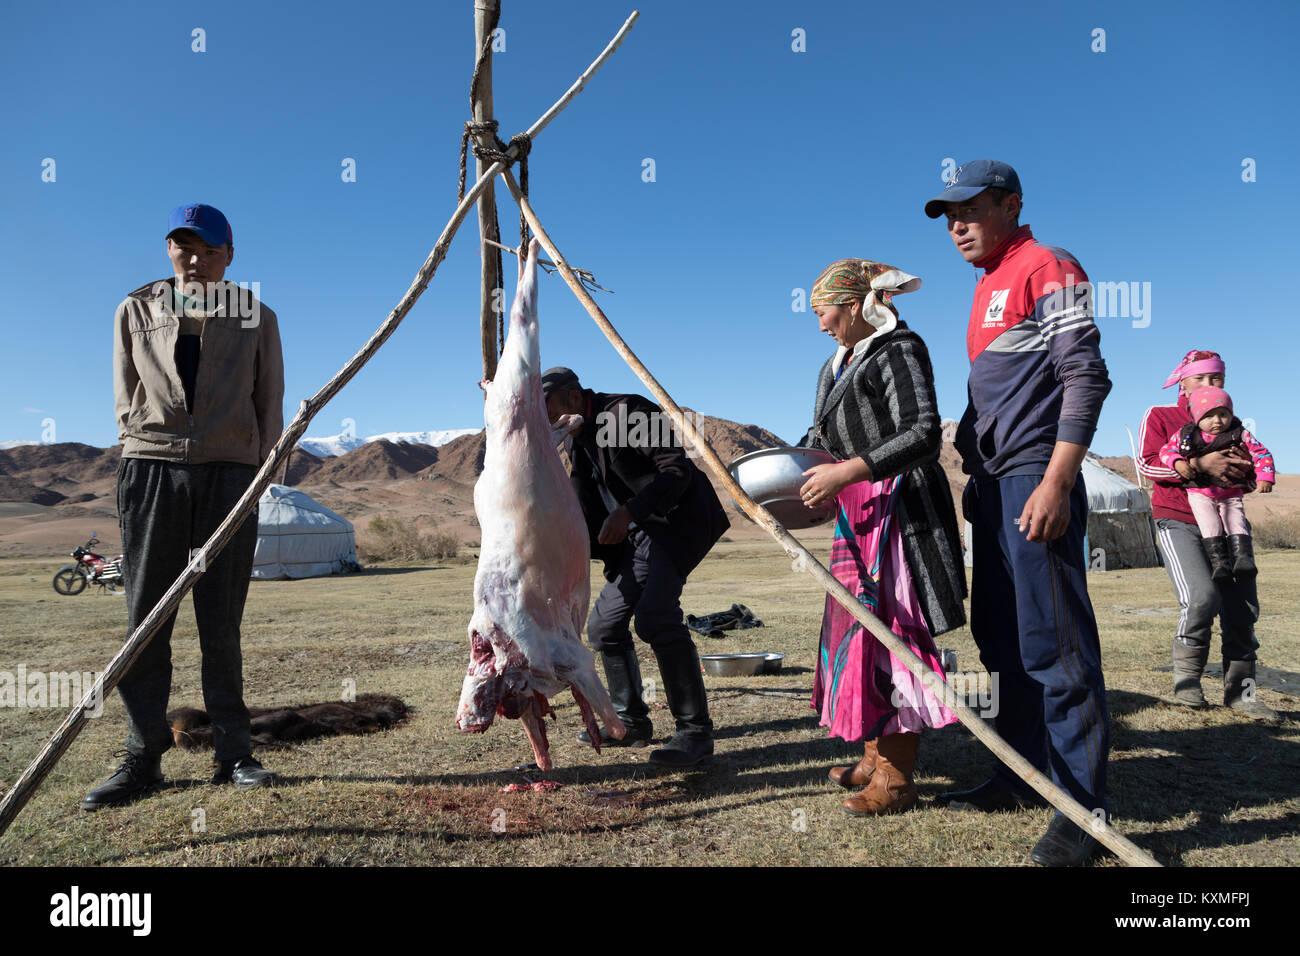 Eagle mongol de la familia hunter carnear carne ovina Mongolia ger Imagen De Stock